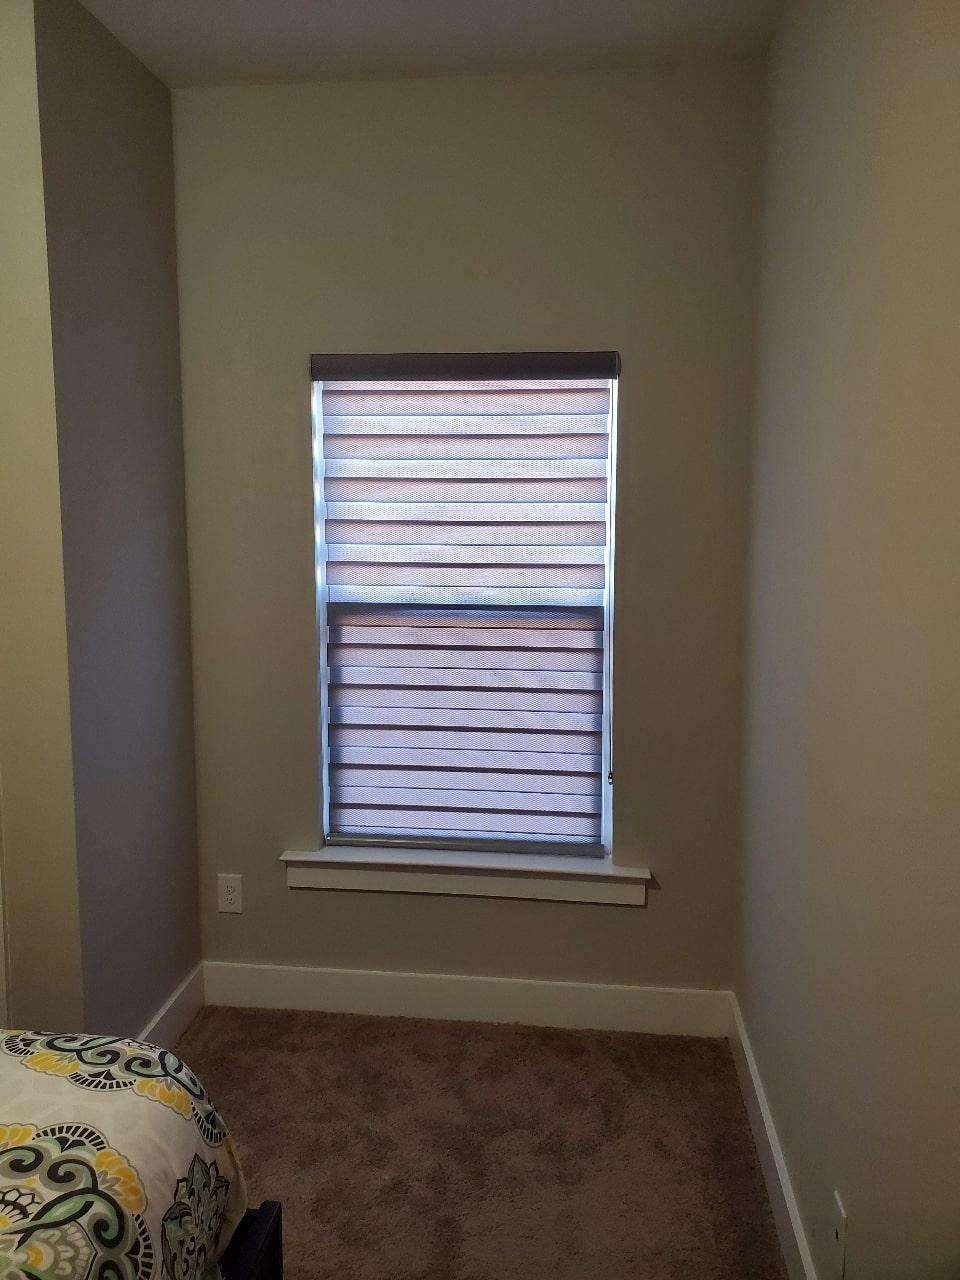 Layered Window Shades - Interior Window Plantation Shutters - Custom, Motorized Window Treatments, Blind Repair, Custom Blinds | Nashville, TN